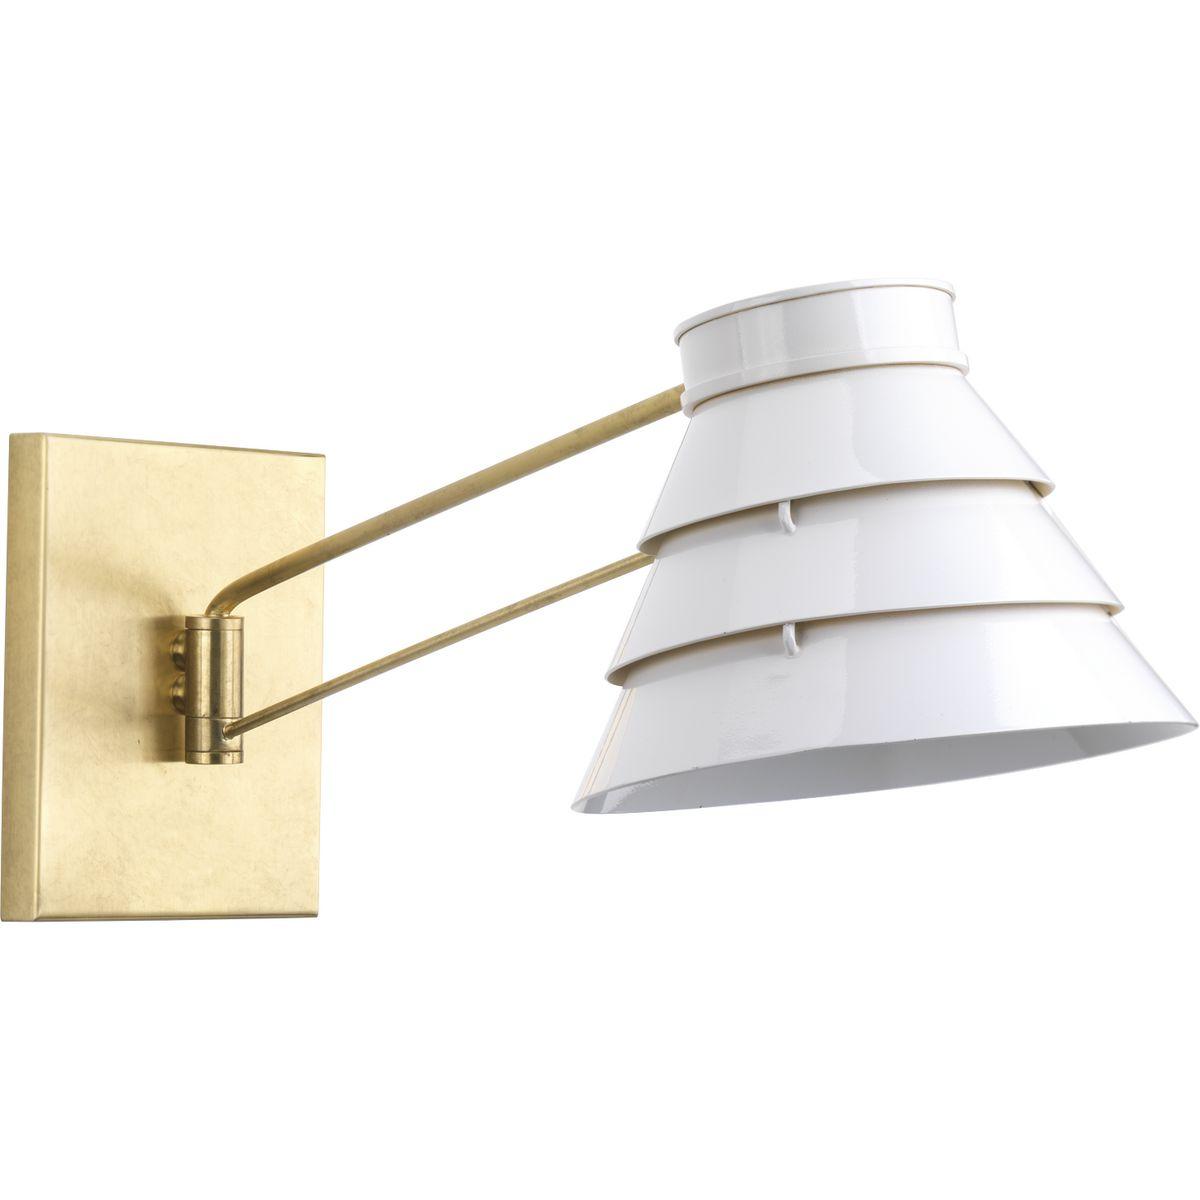 Jeffrey Alan Marks Onshore Collection Swing Arm Wall Sconce P710070 160 Progress Lighting